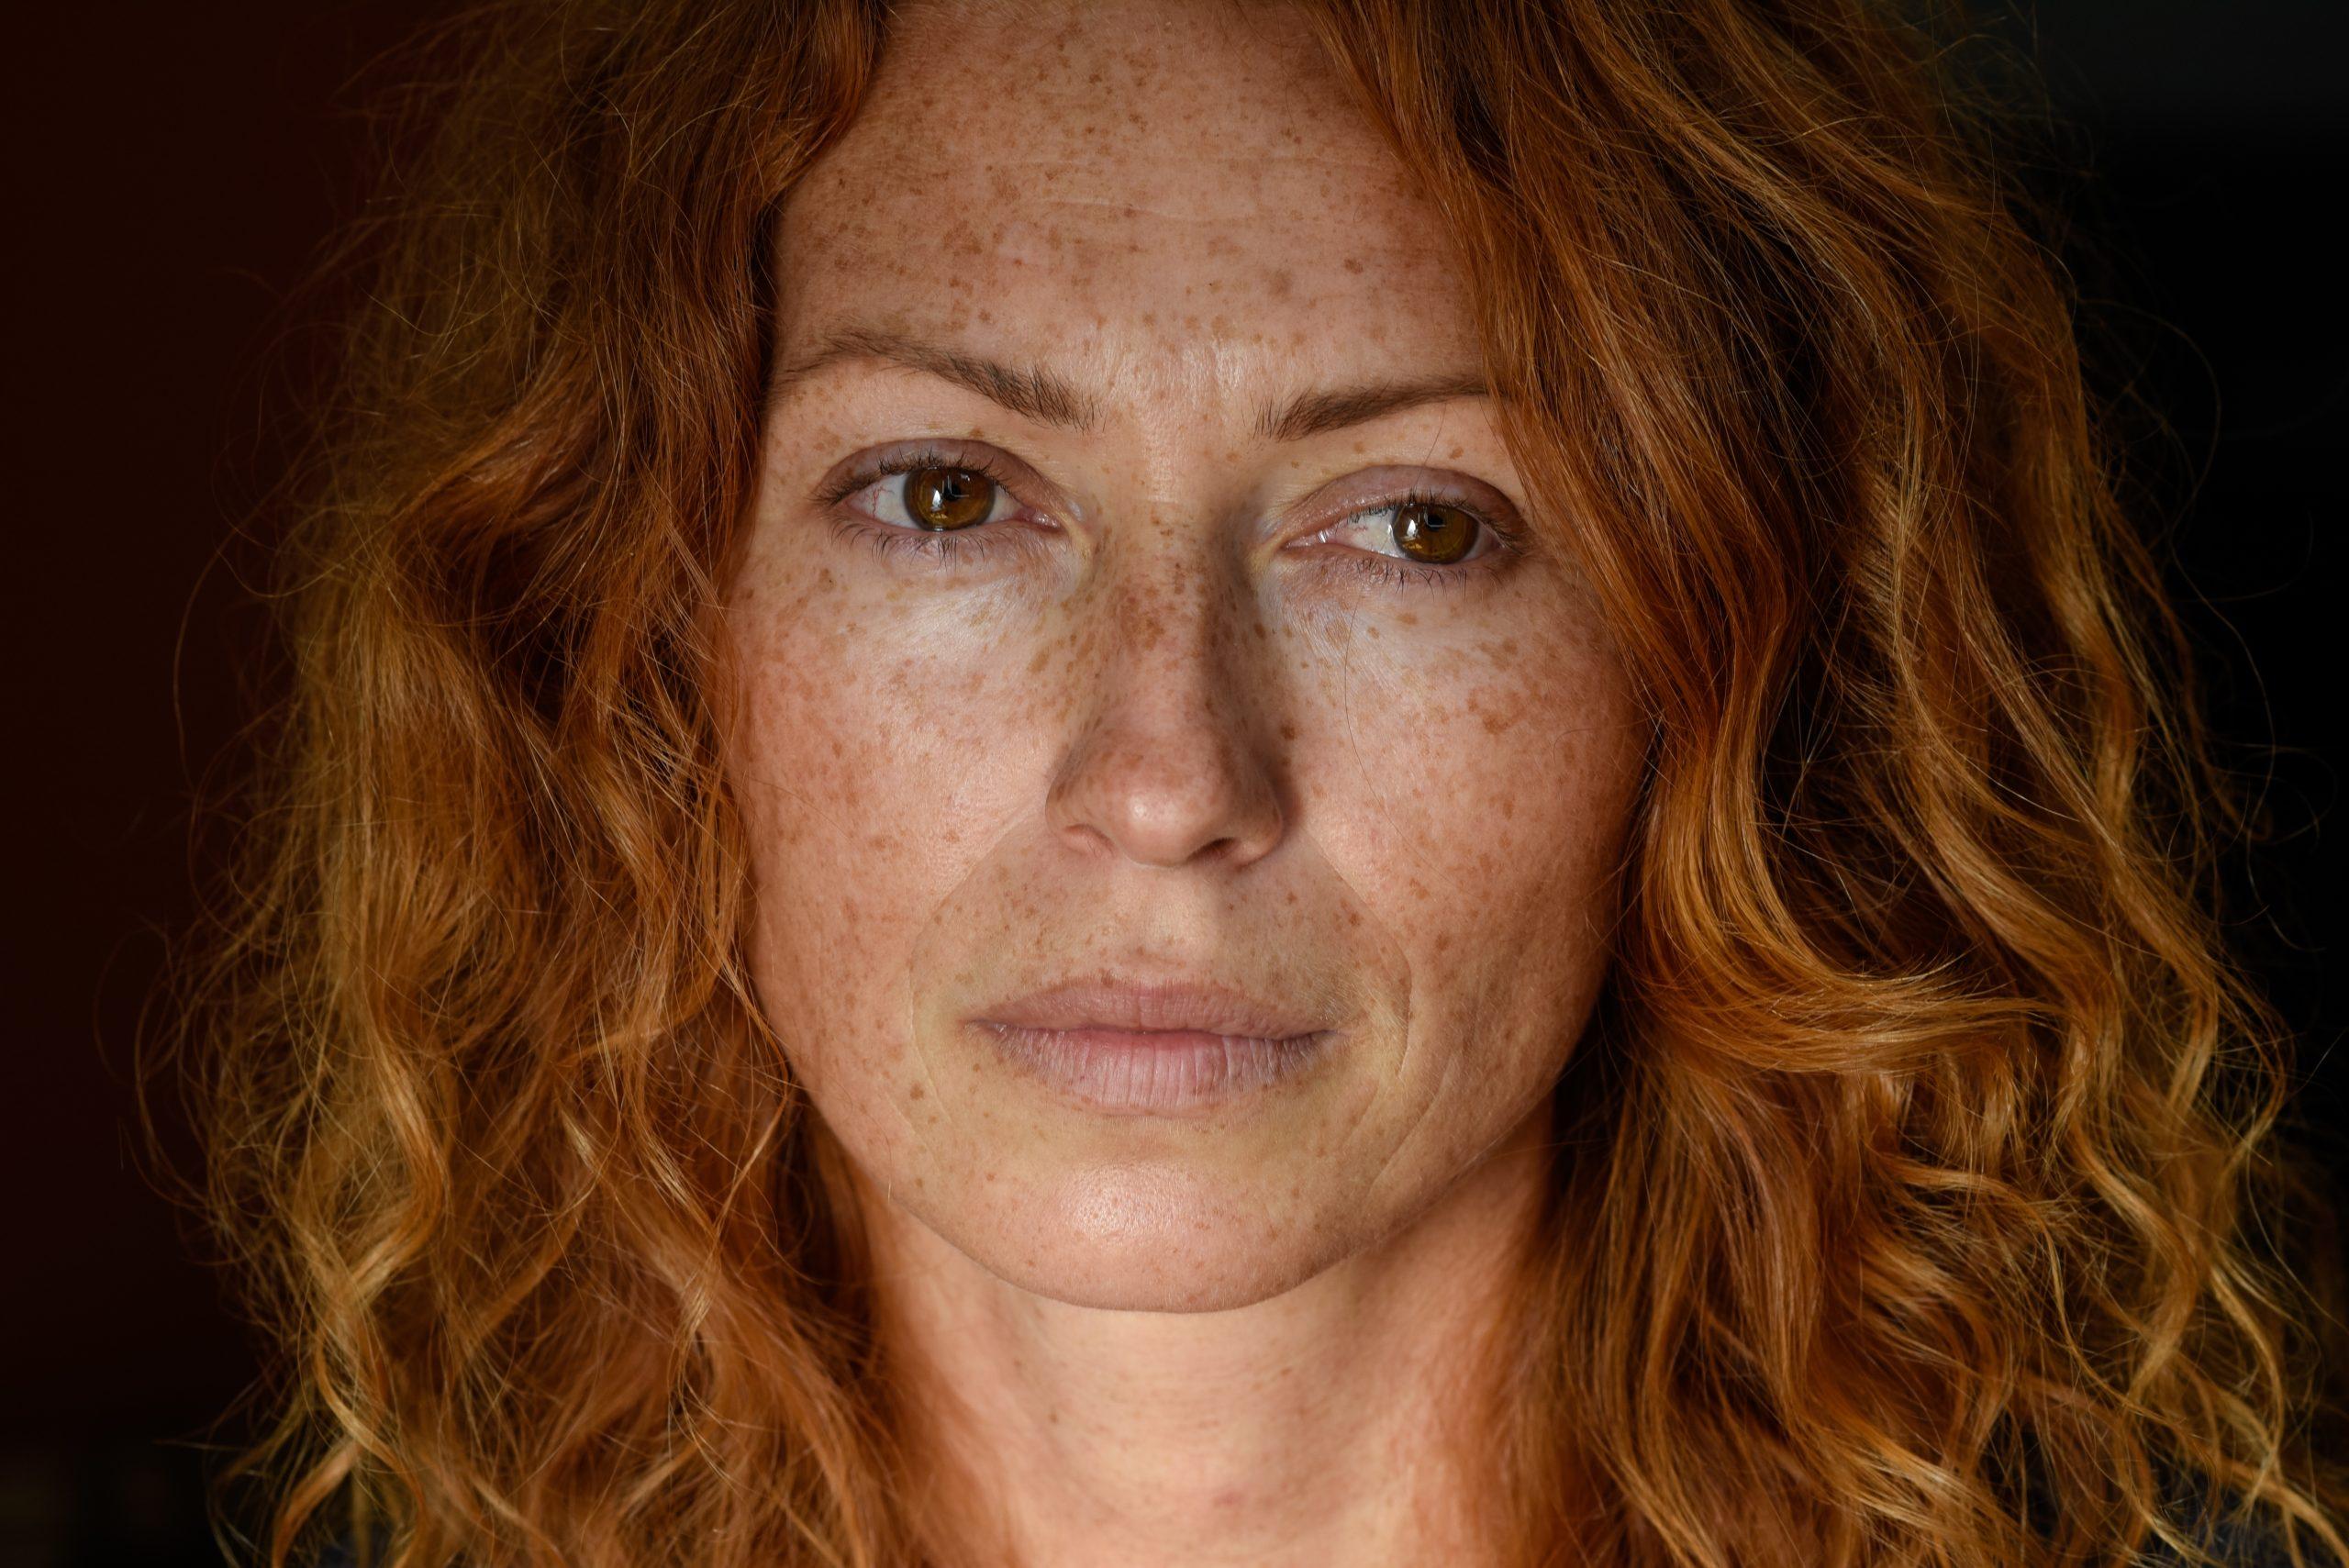 National Redhead Day: Miriam Diaz